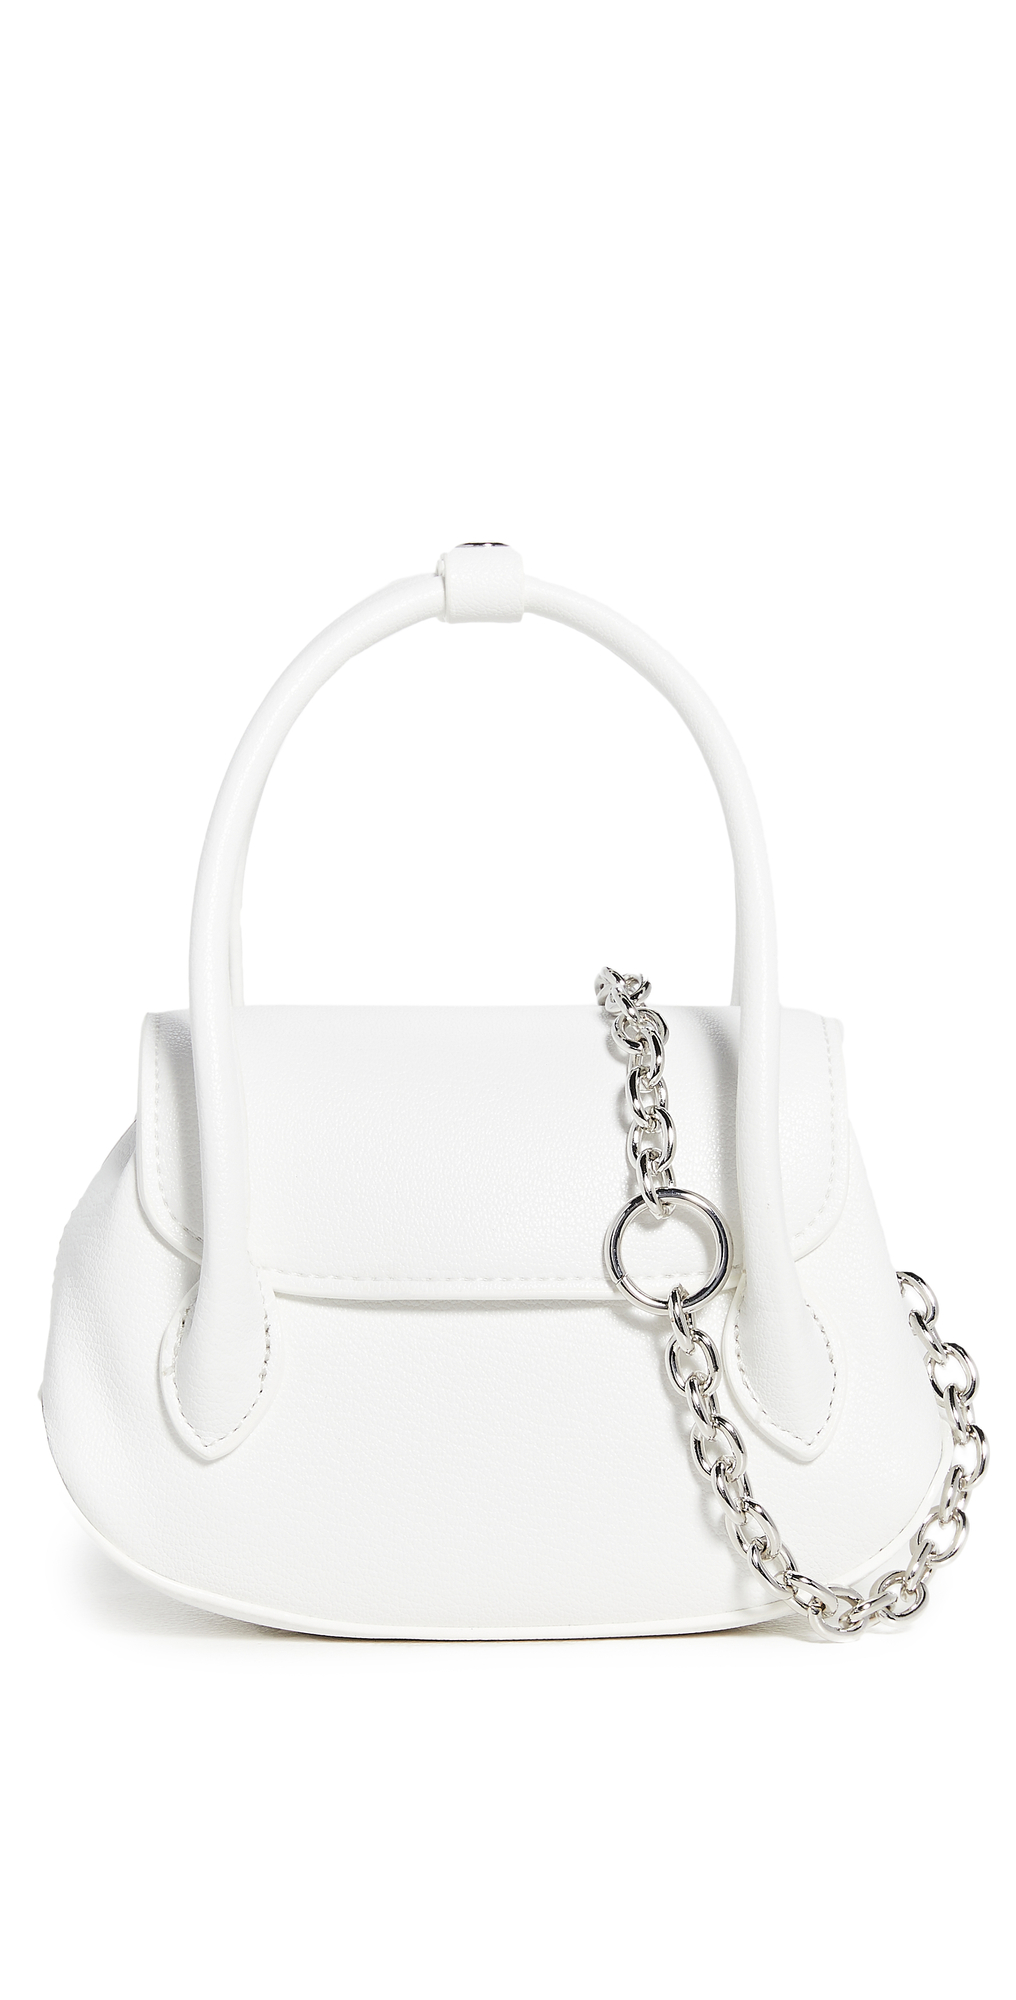 H.O.W. We Shimmy Mini Bag